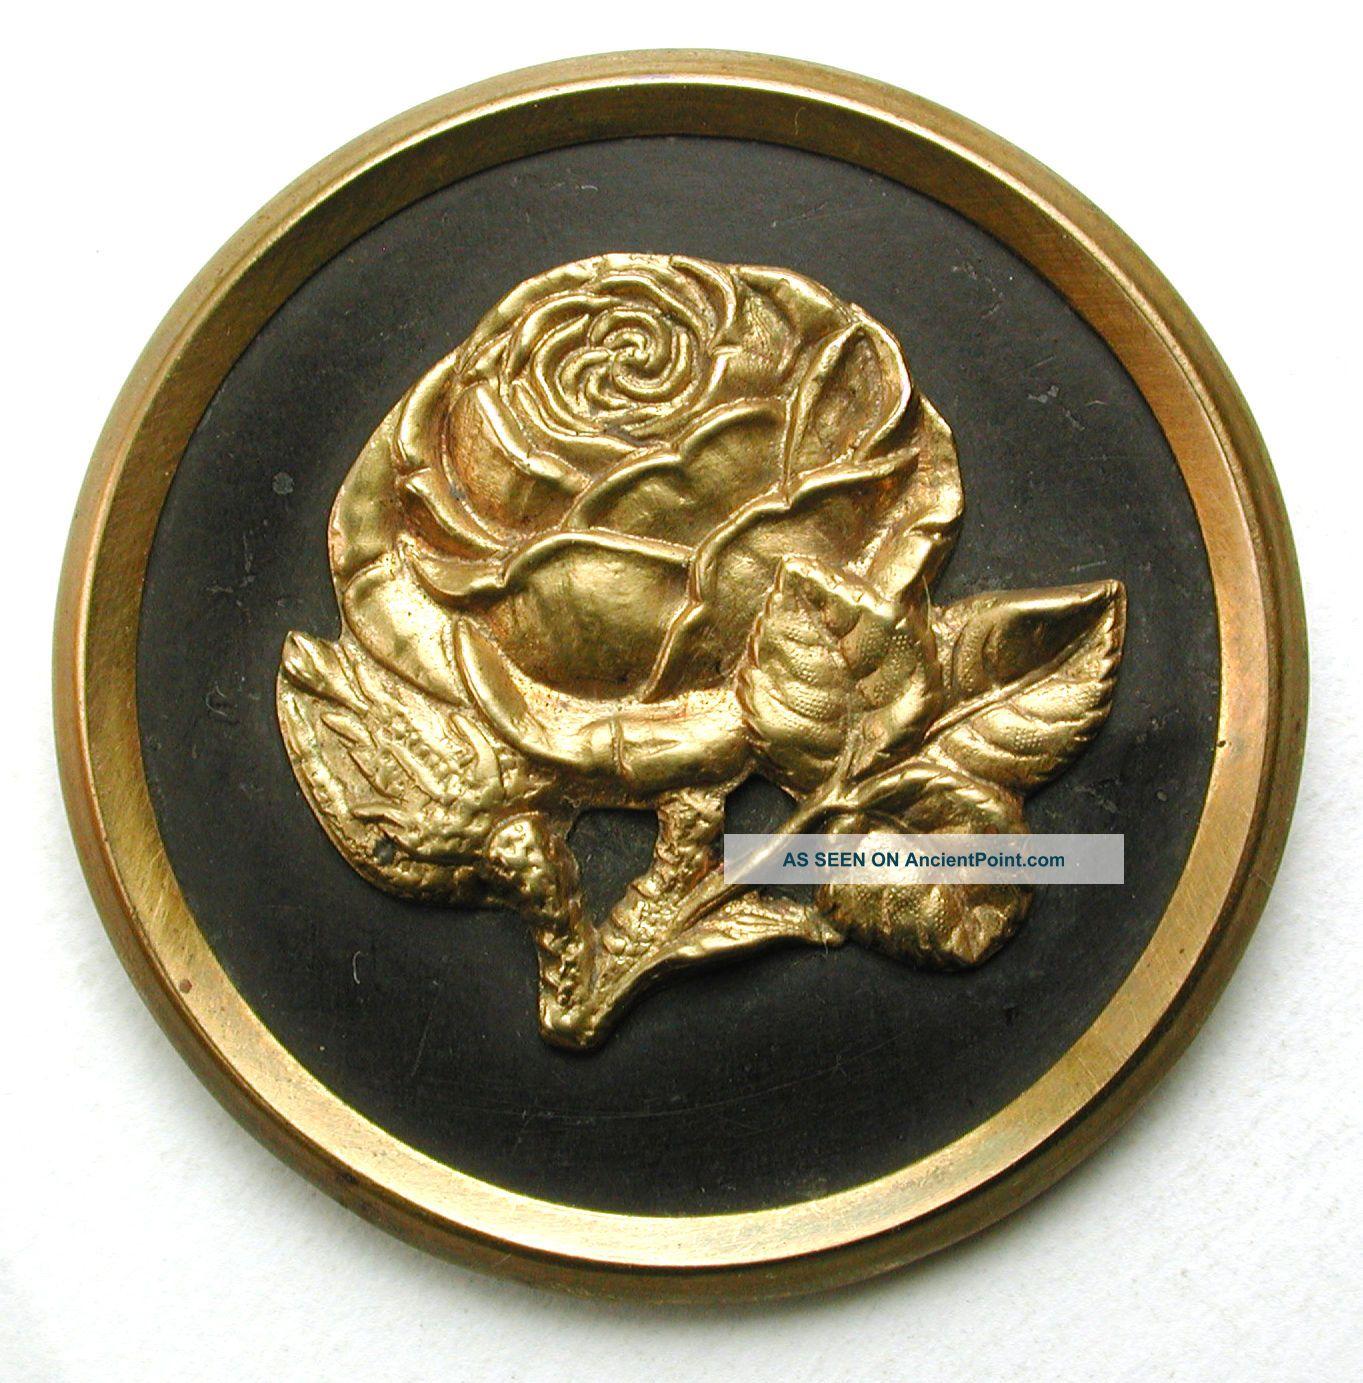 Lg Sz Antique Brass Button Detailed Rose Flower Pictorial Design - 1 & 7/16